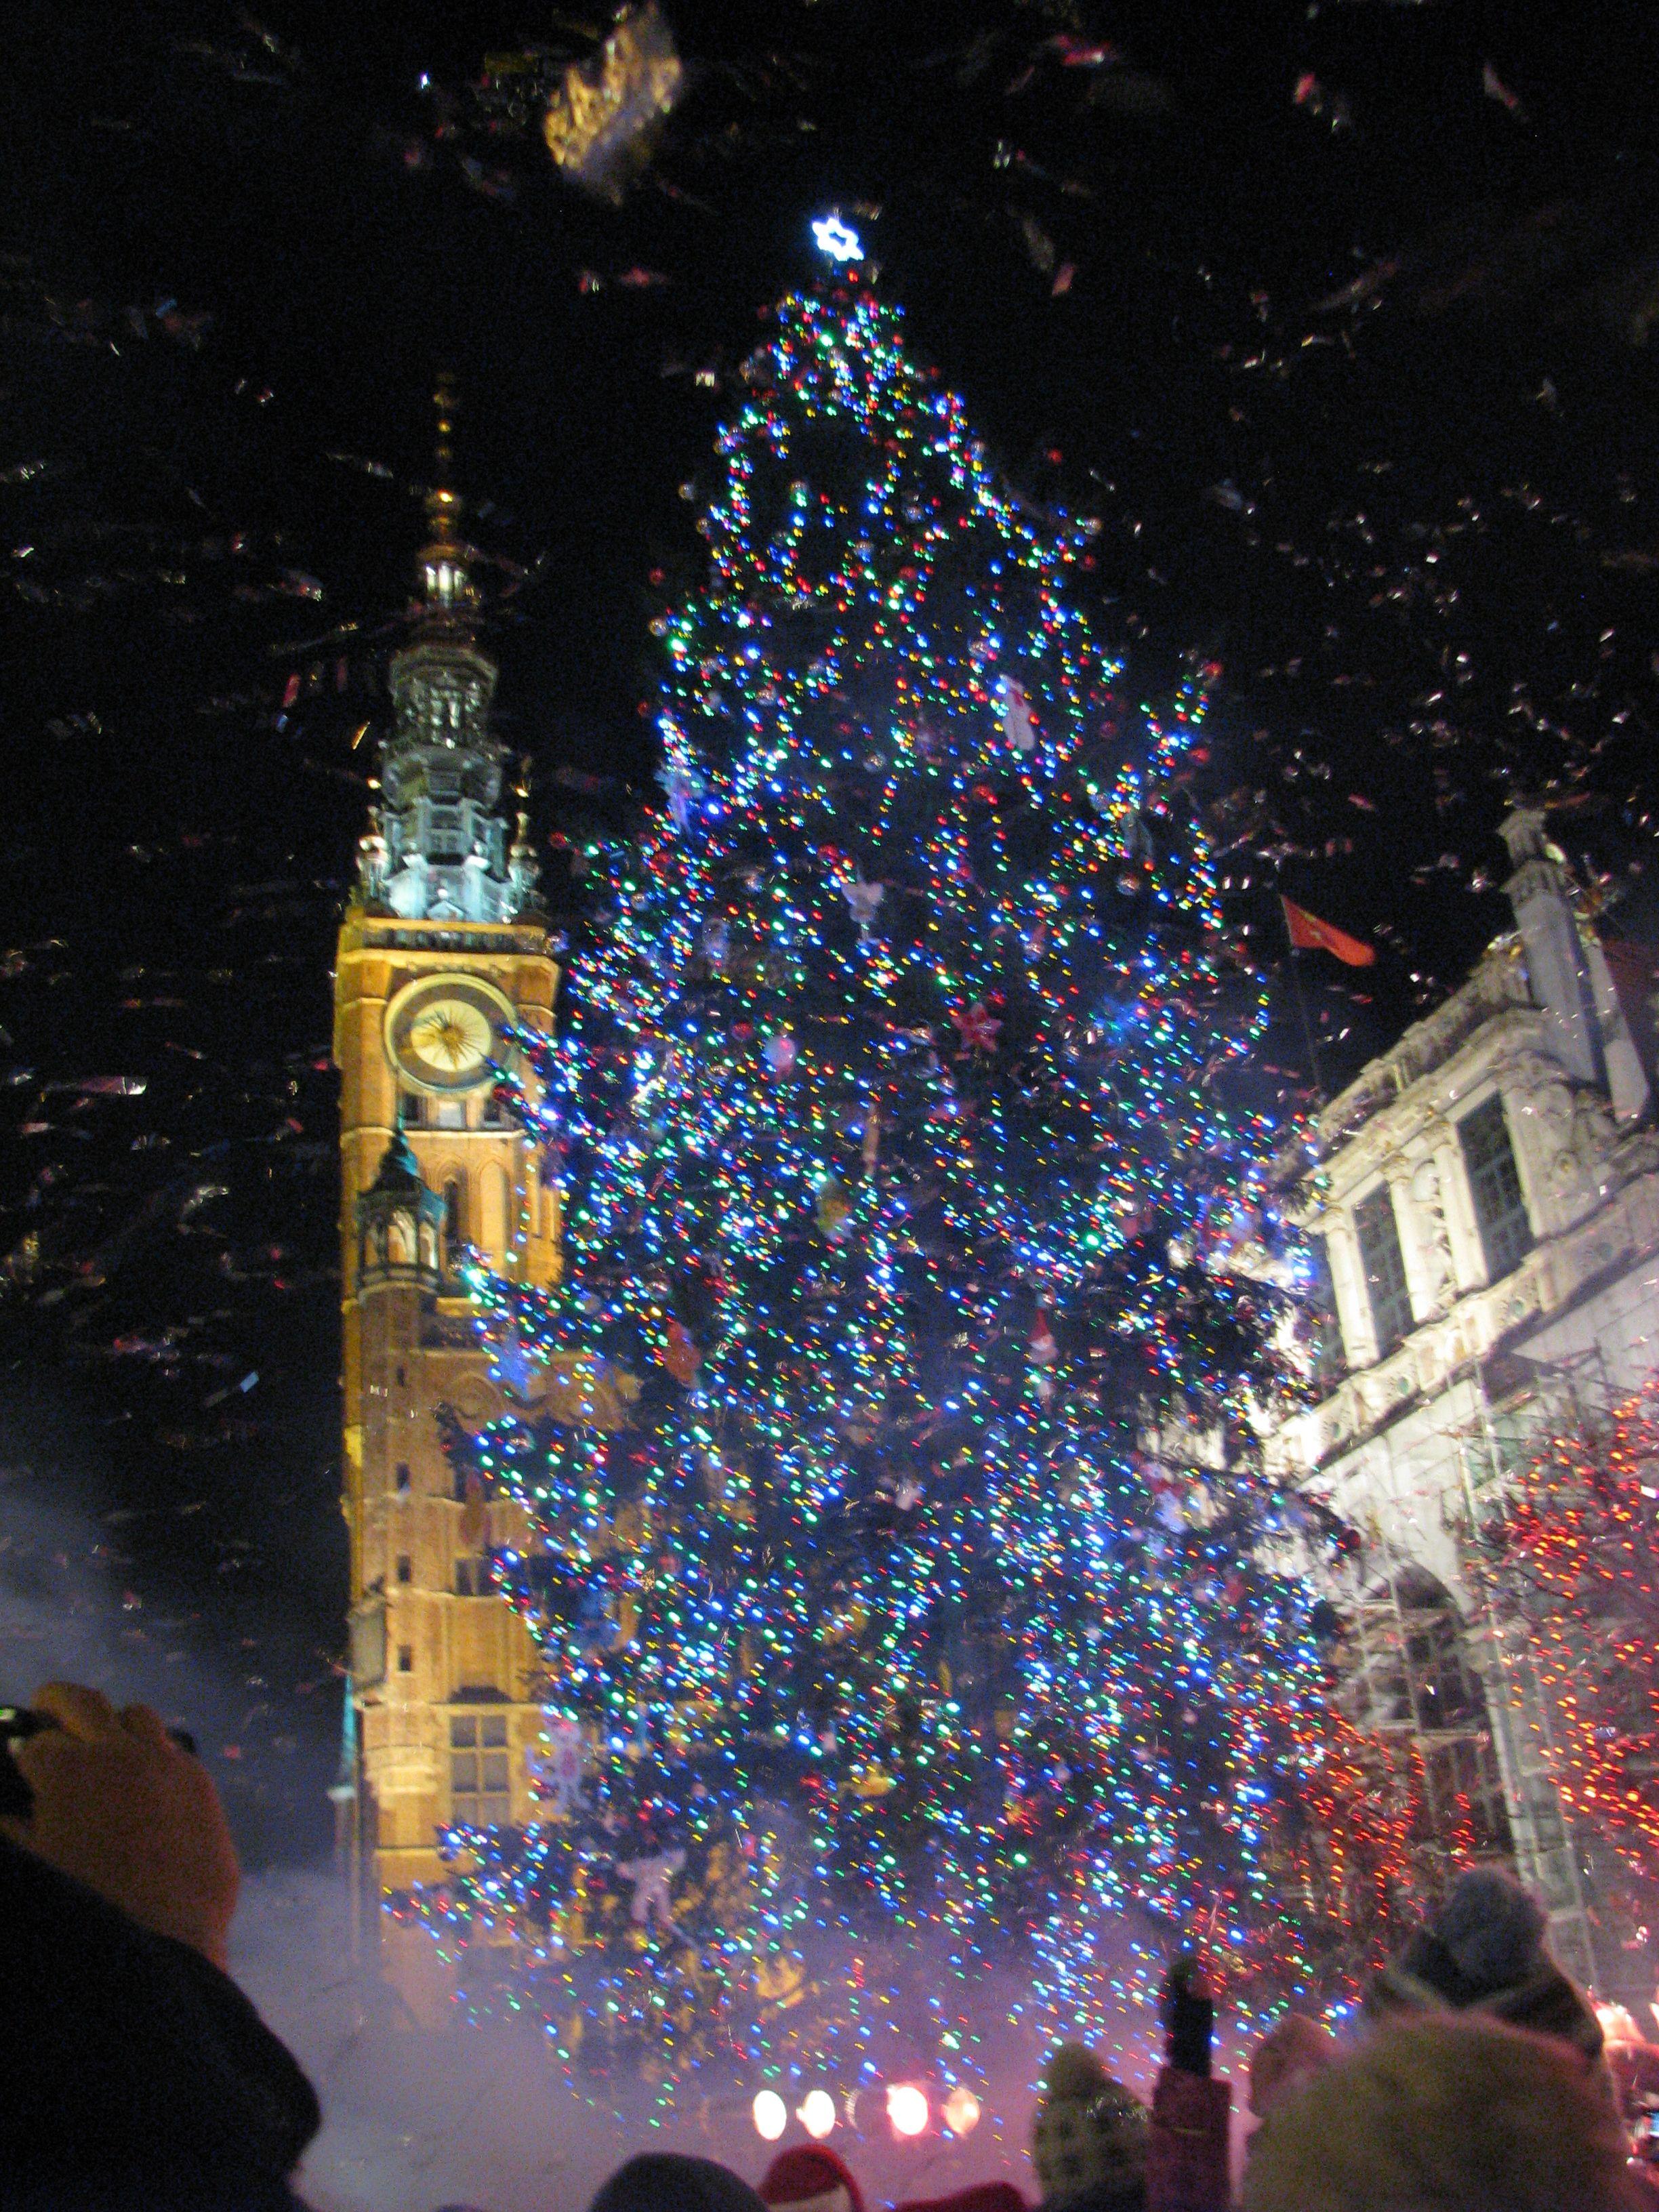 #christmas tree in #Gdansk | Poland photo: Radek Selonka i Ola Leszczyńska